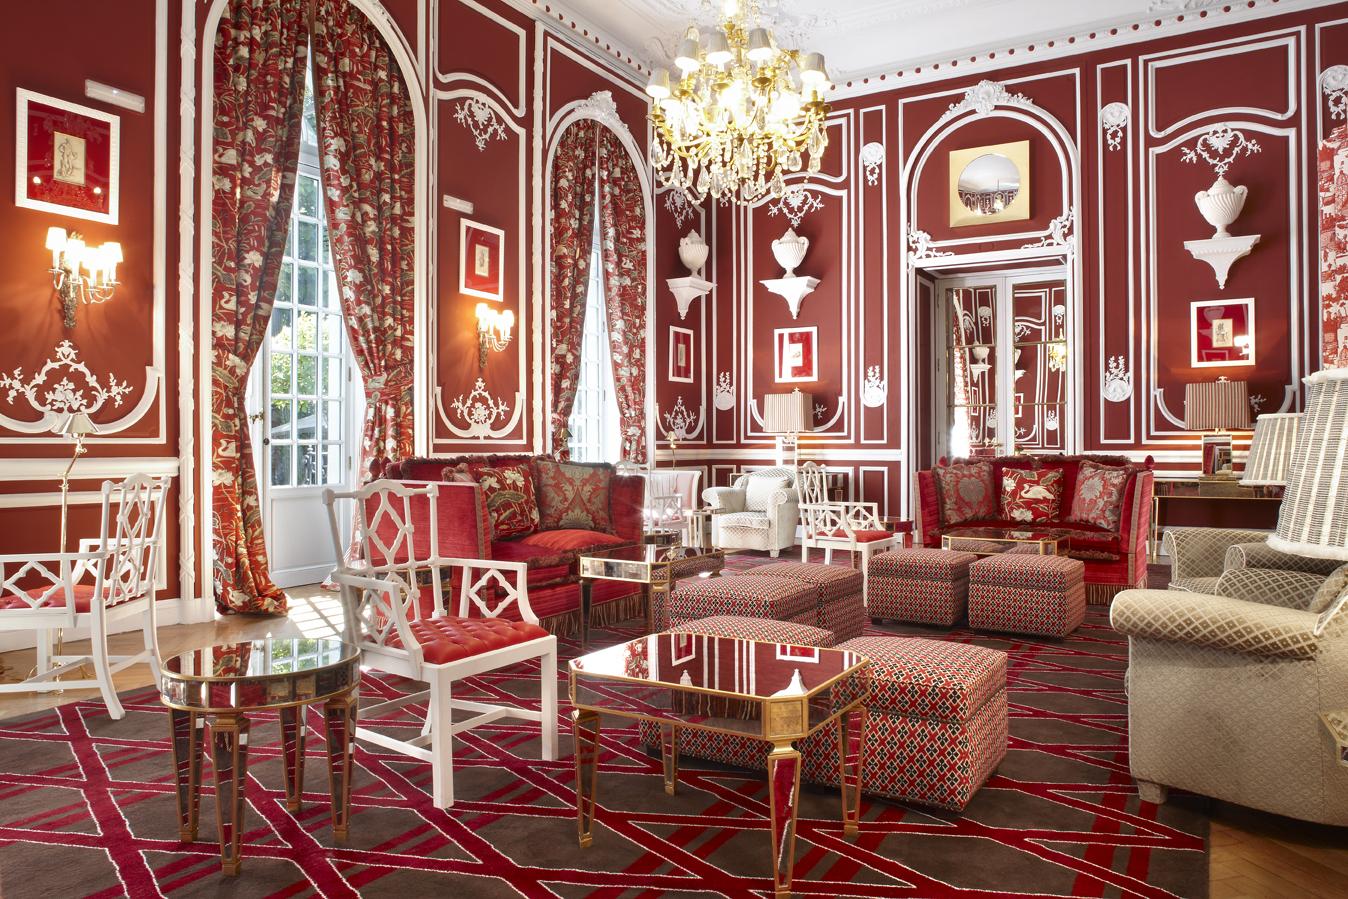 Hotel Santo Mauro Madrid (AC) - Red Room